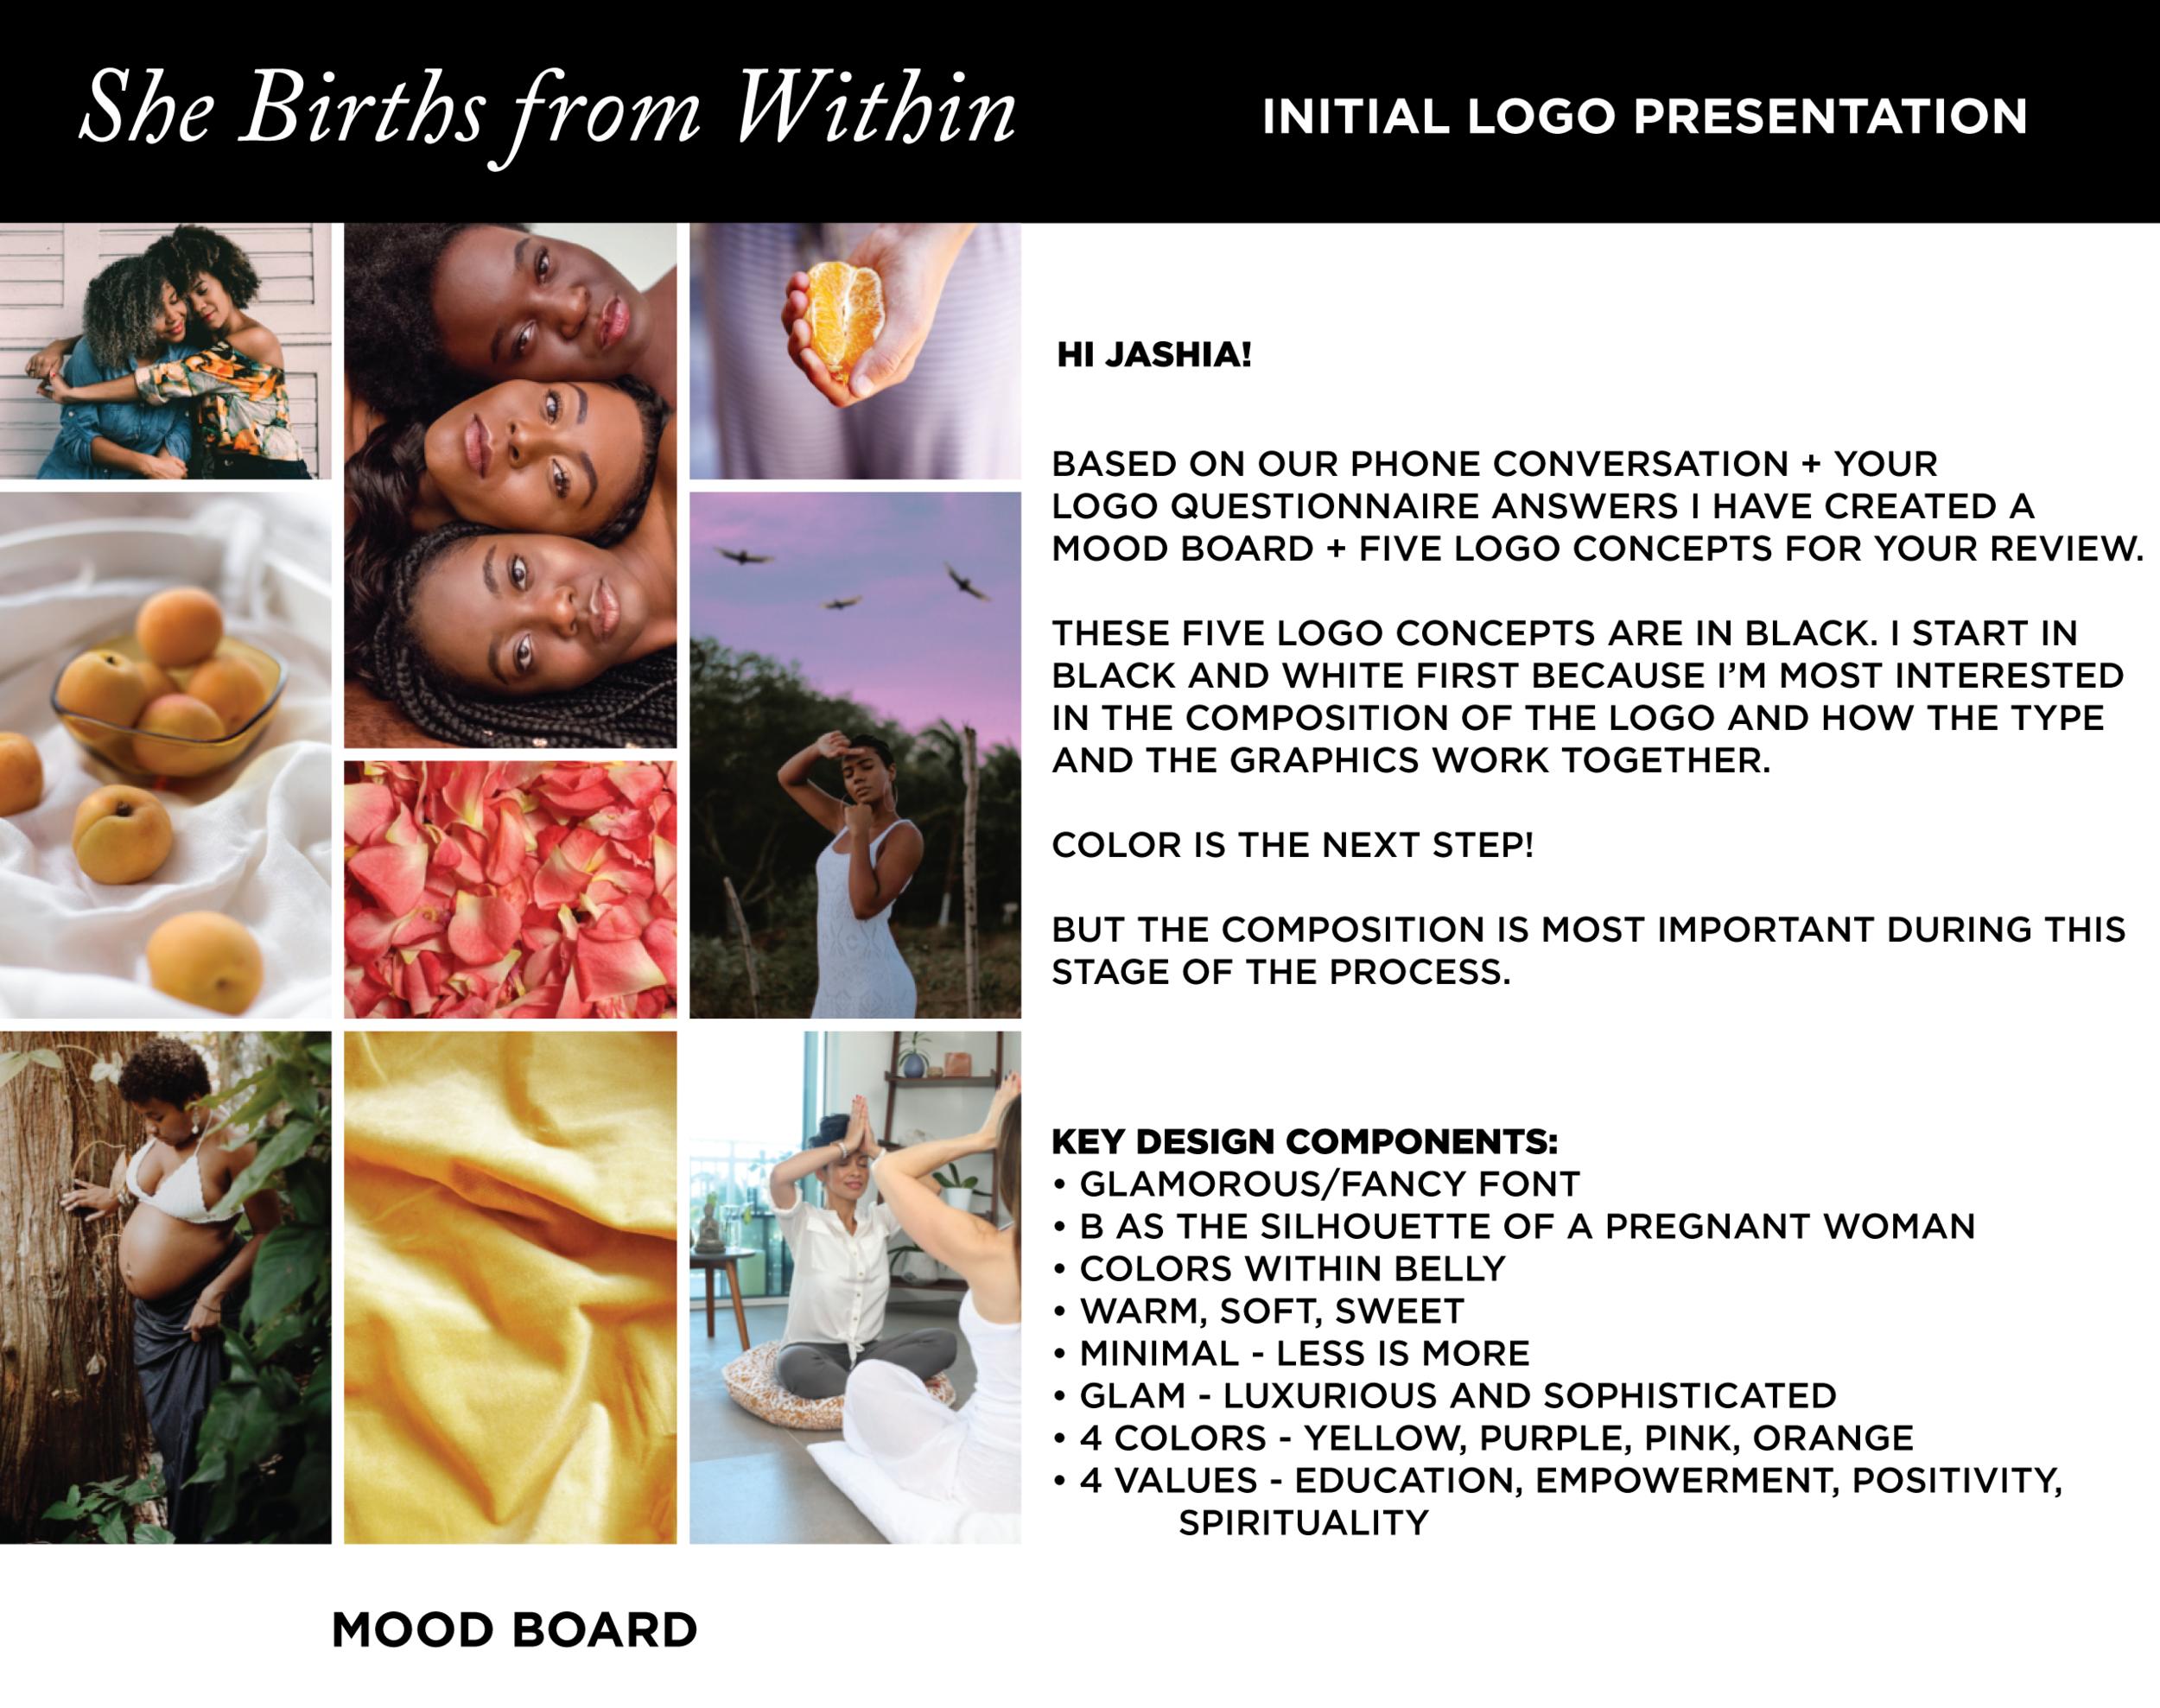 logo concepts-1_Intro-Mood Board.png